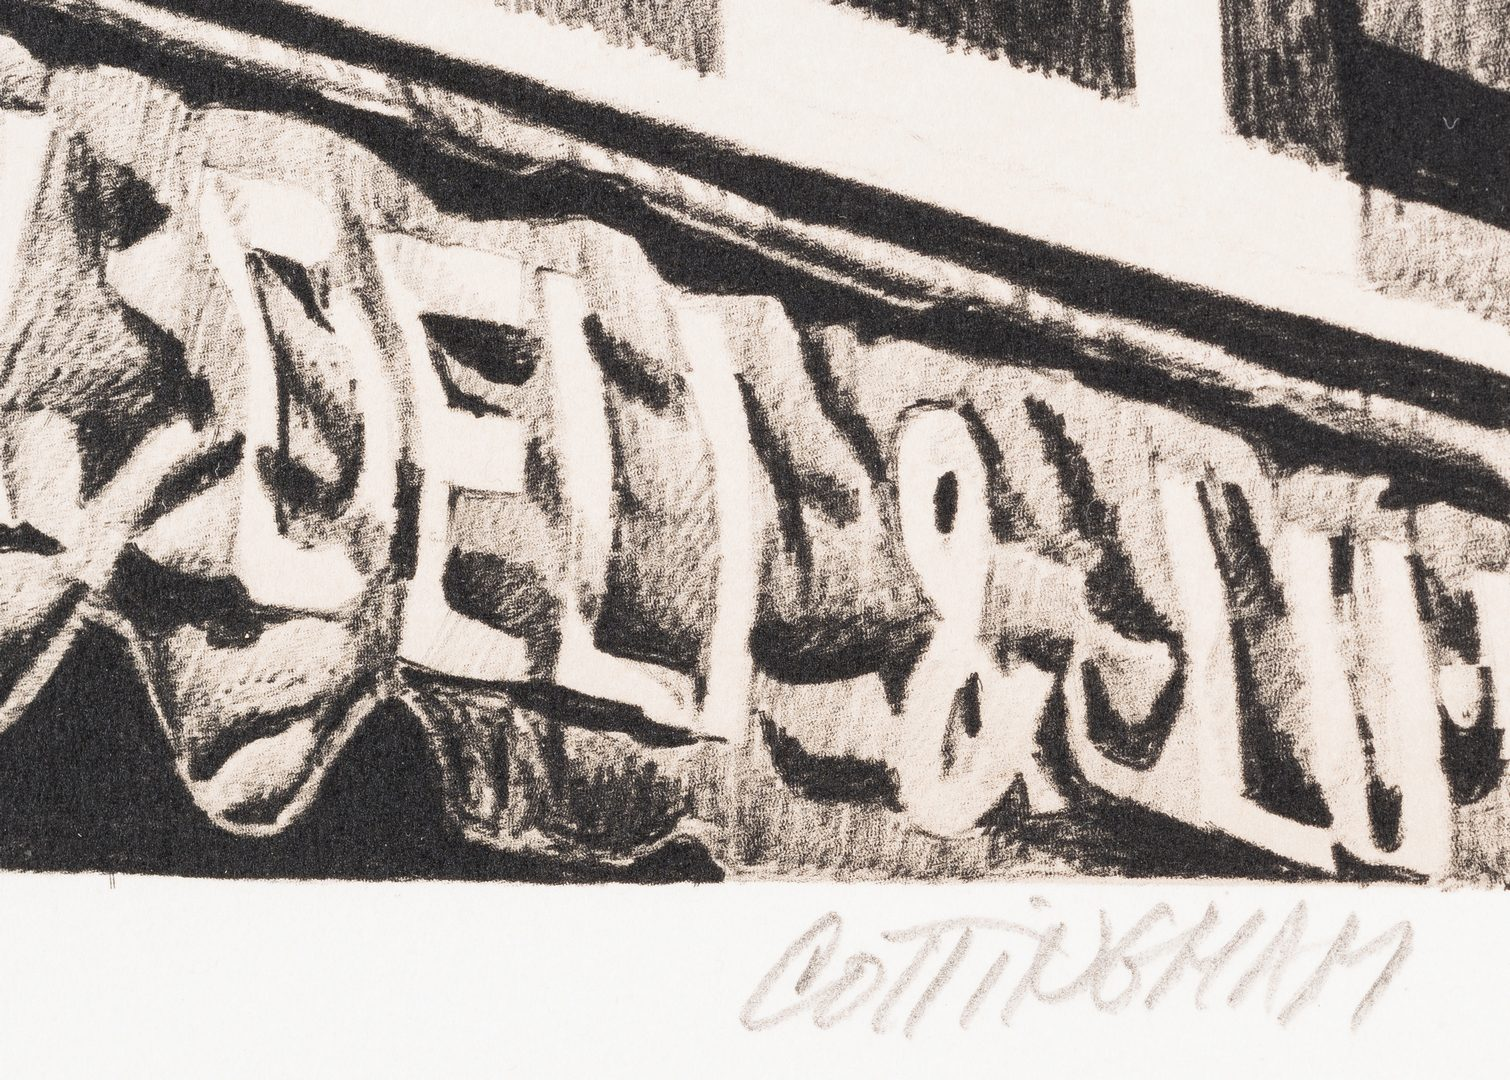 Lot 481: 2 Robert Cottingham Lithographs